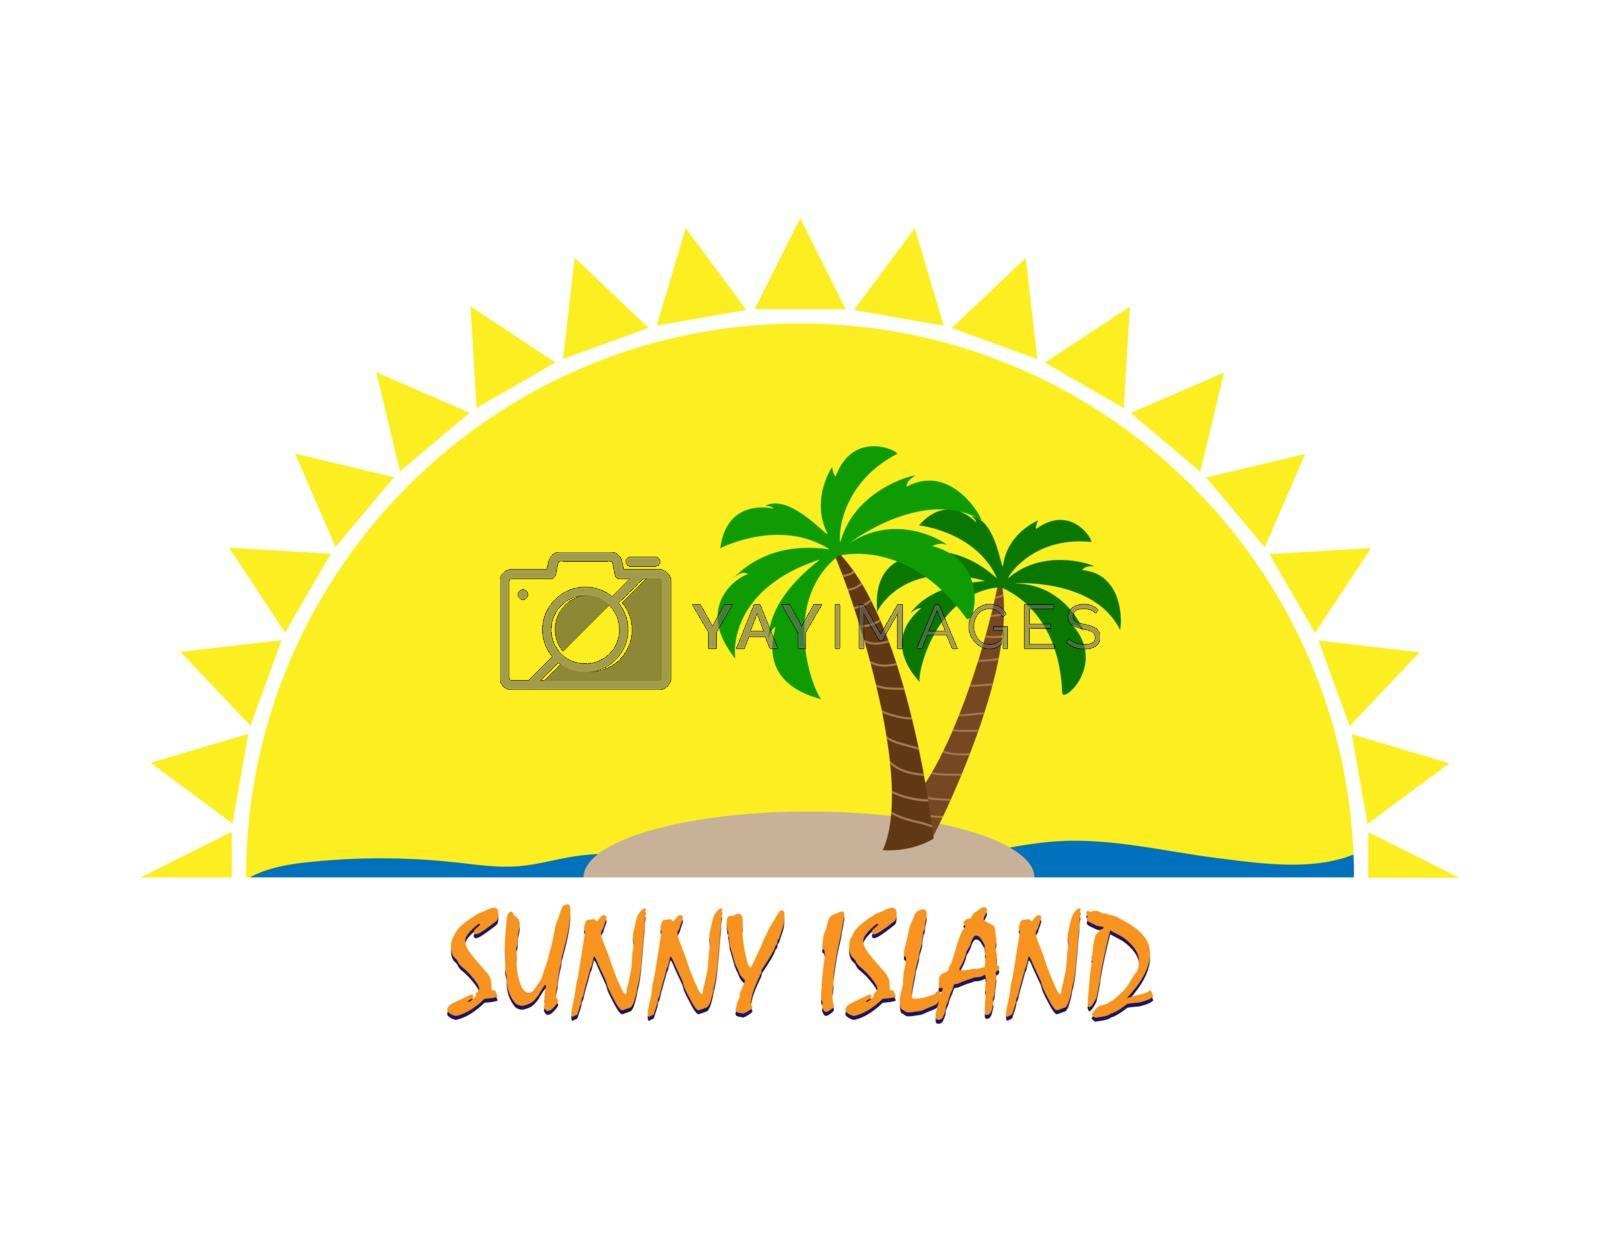 Sun logo and inscription Sunny Island, flat design, color image